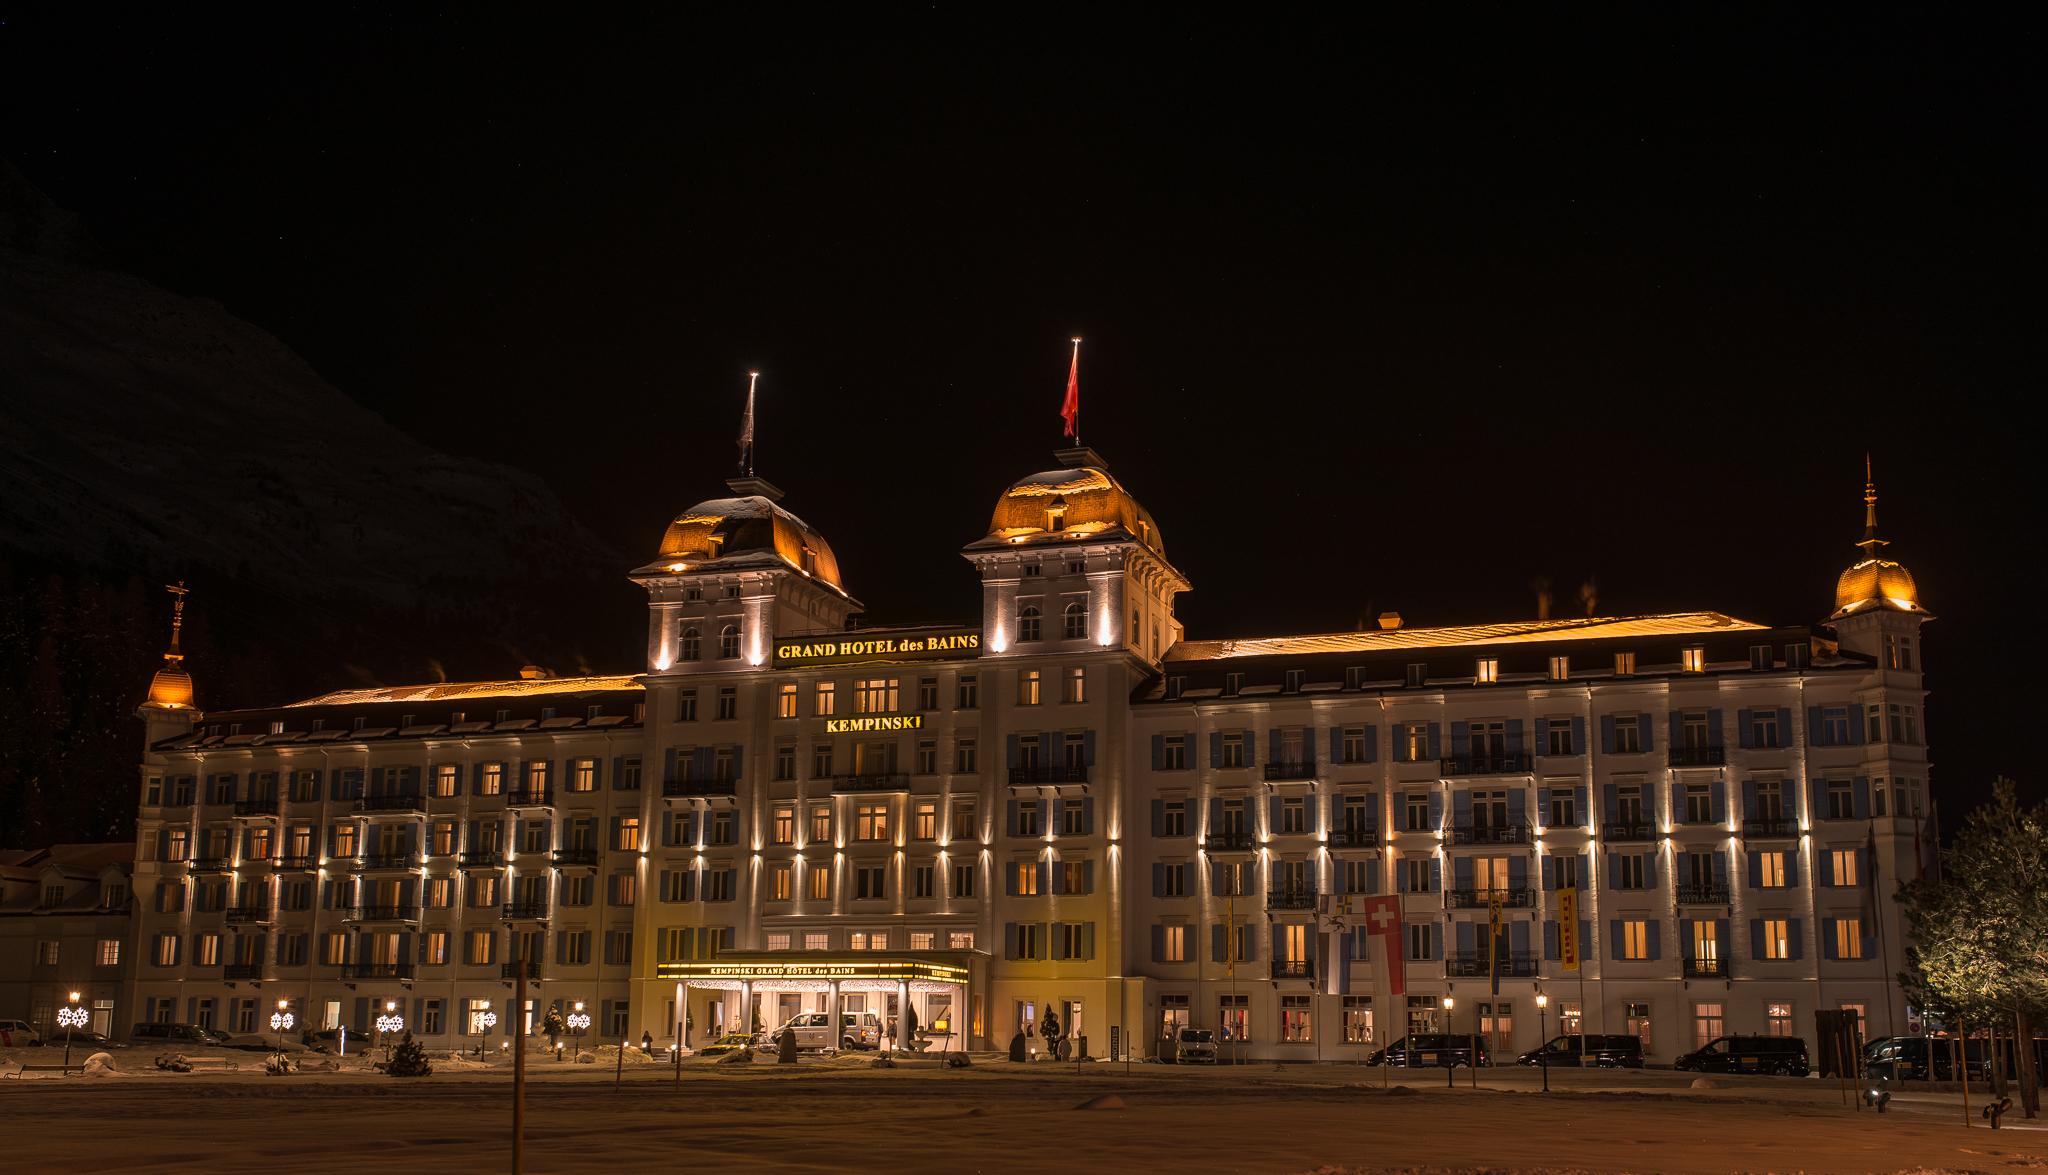 Kempinski - St. Moritz